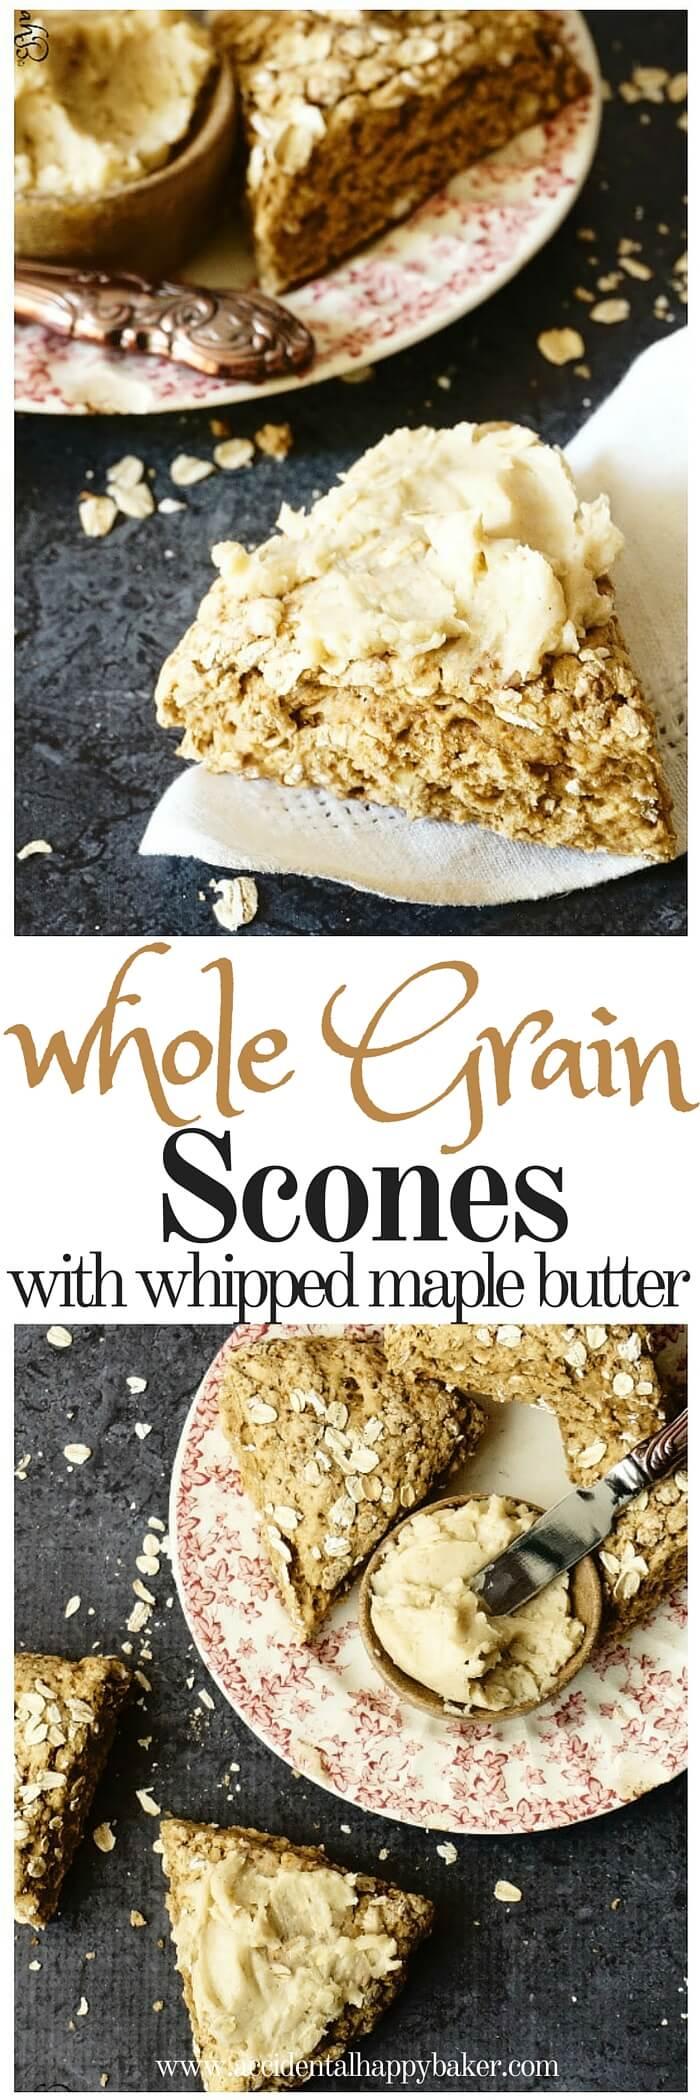 Whole Grain Scones with creamy Maple Butter